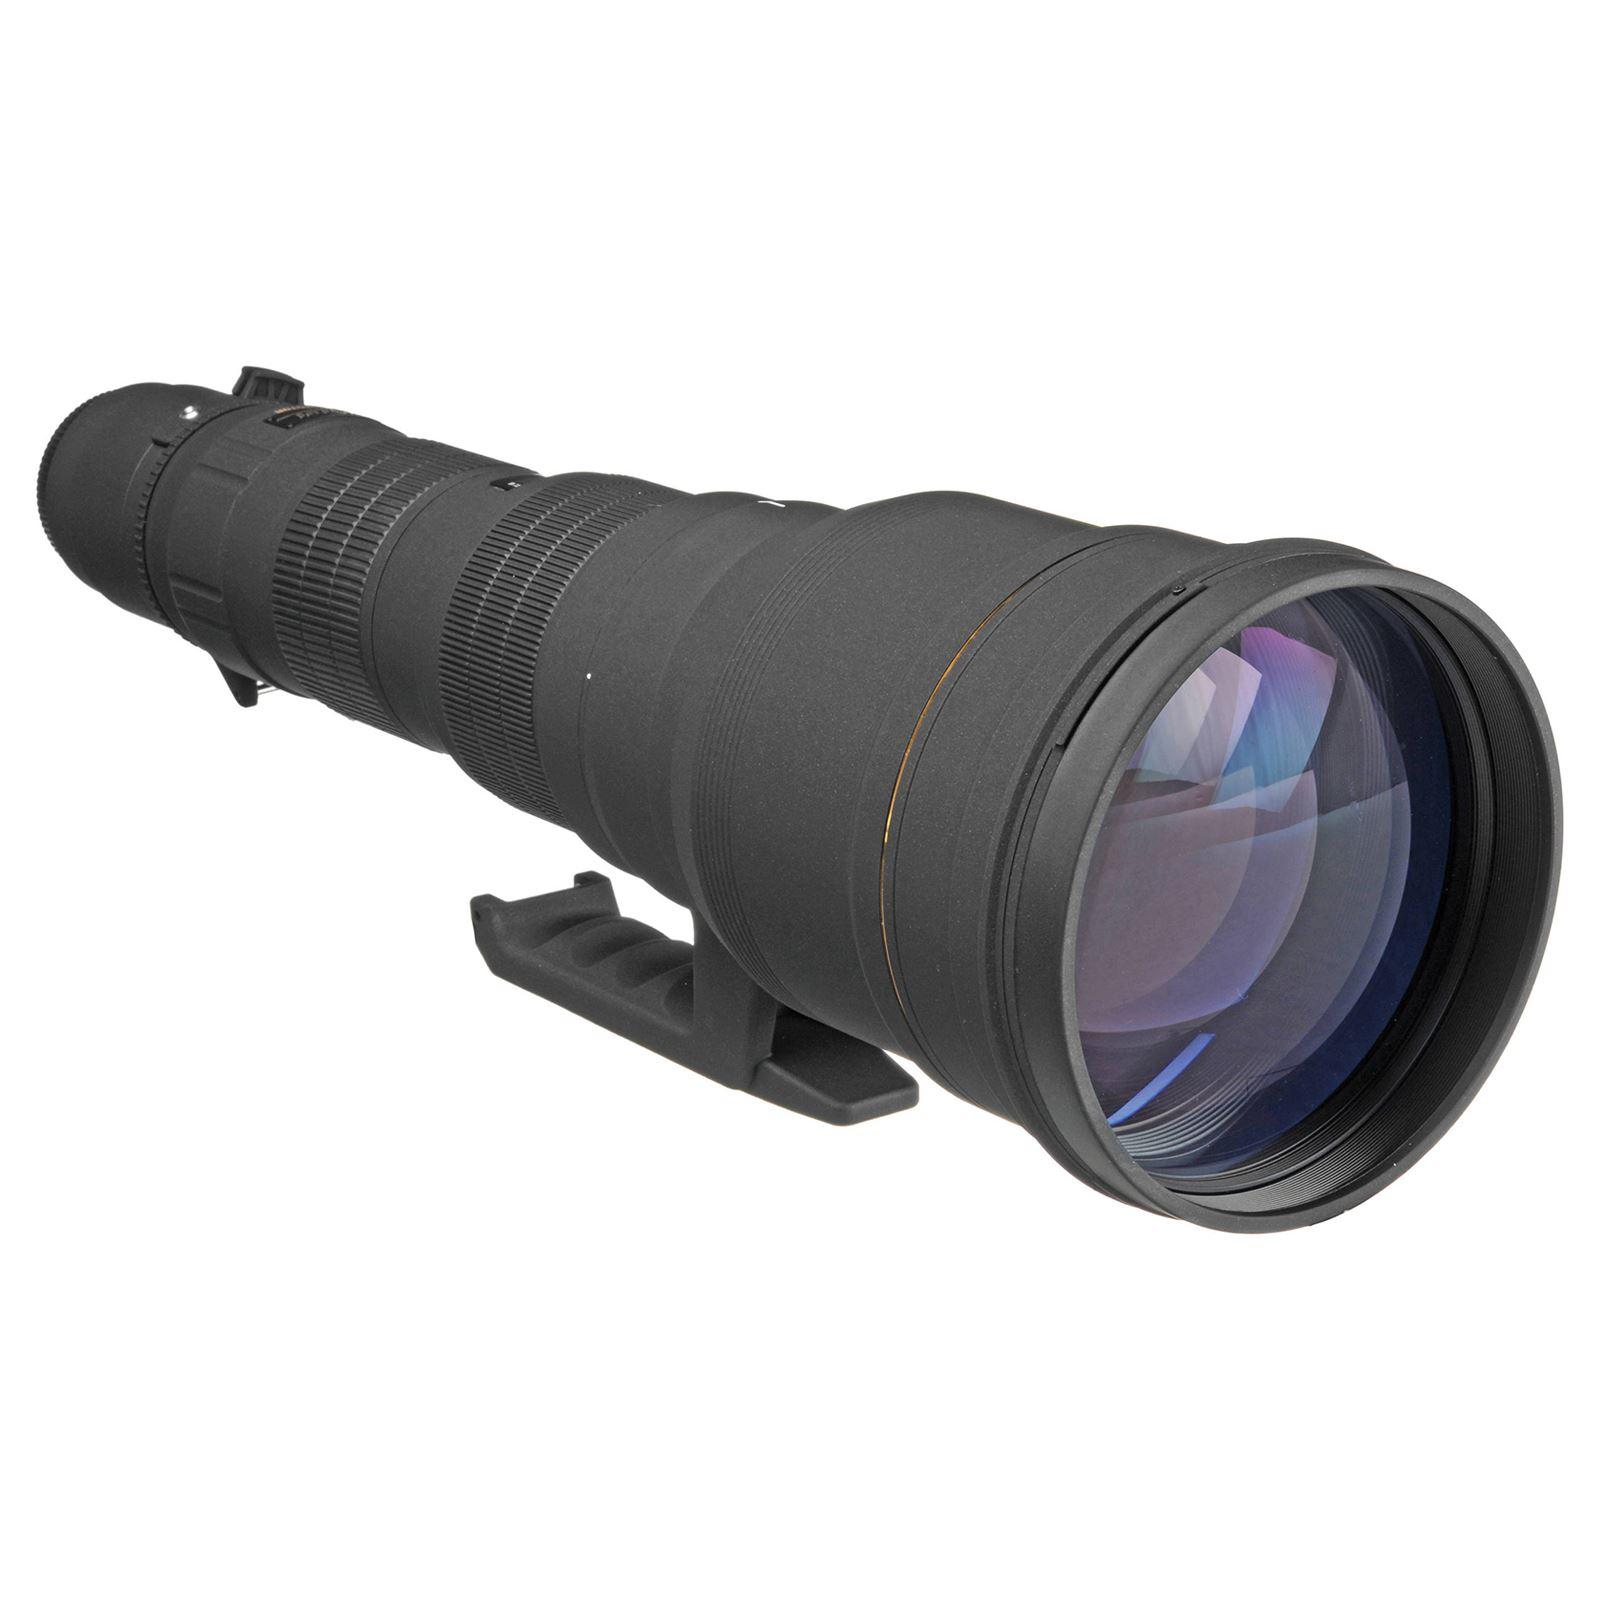 Sigma 300-800mm f5.6 EX DG APO HSM Lens - Nikon Fit